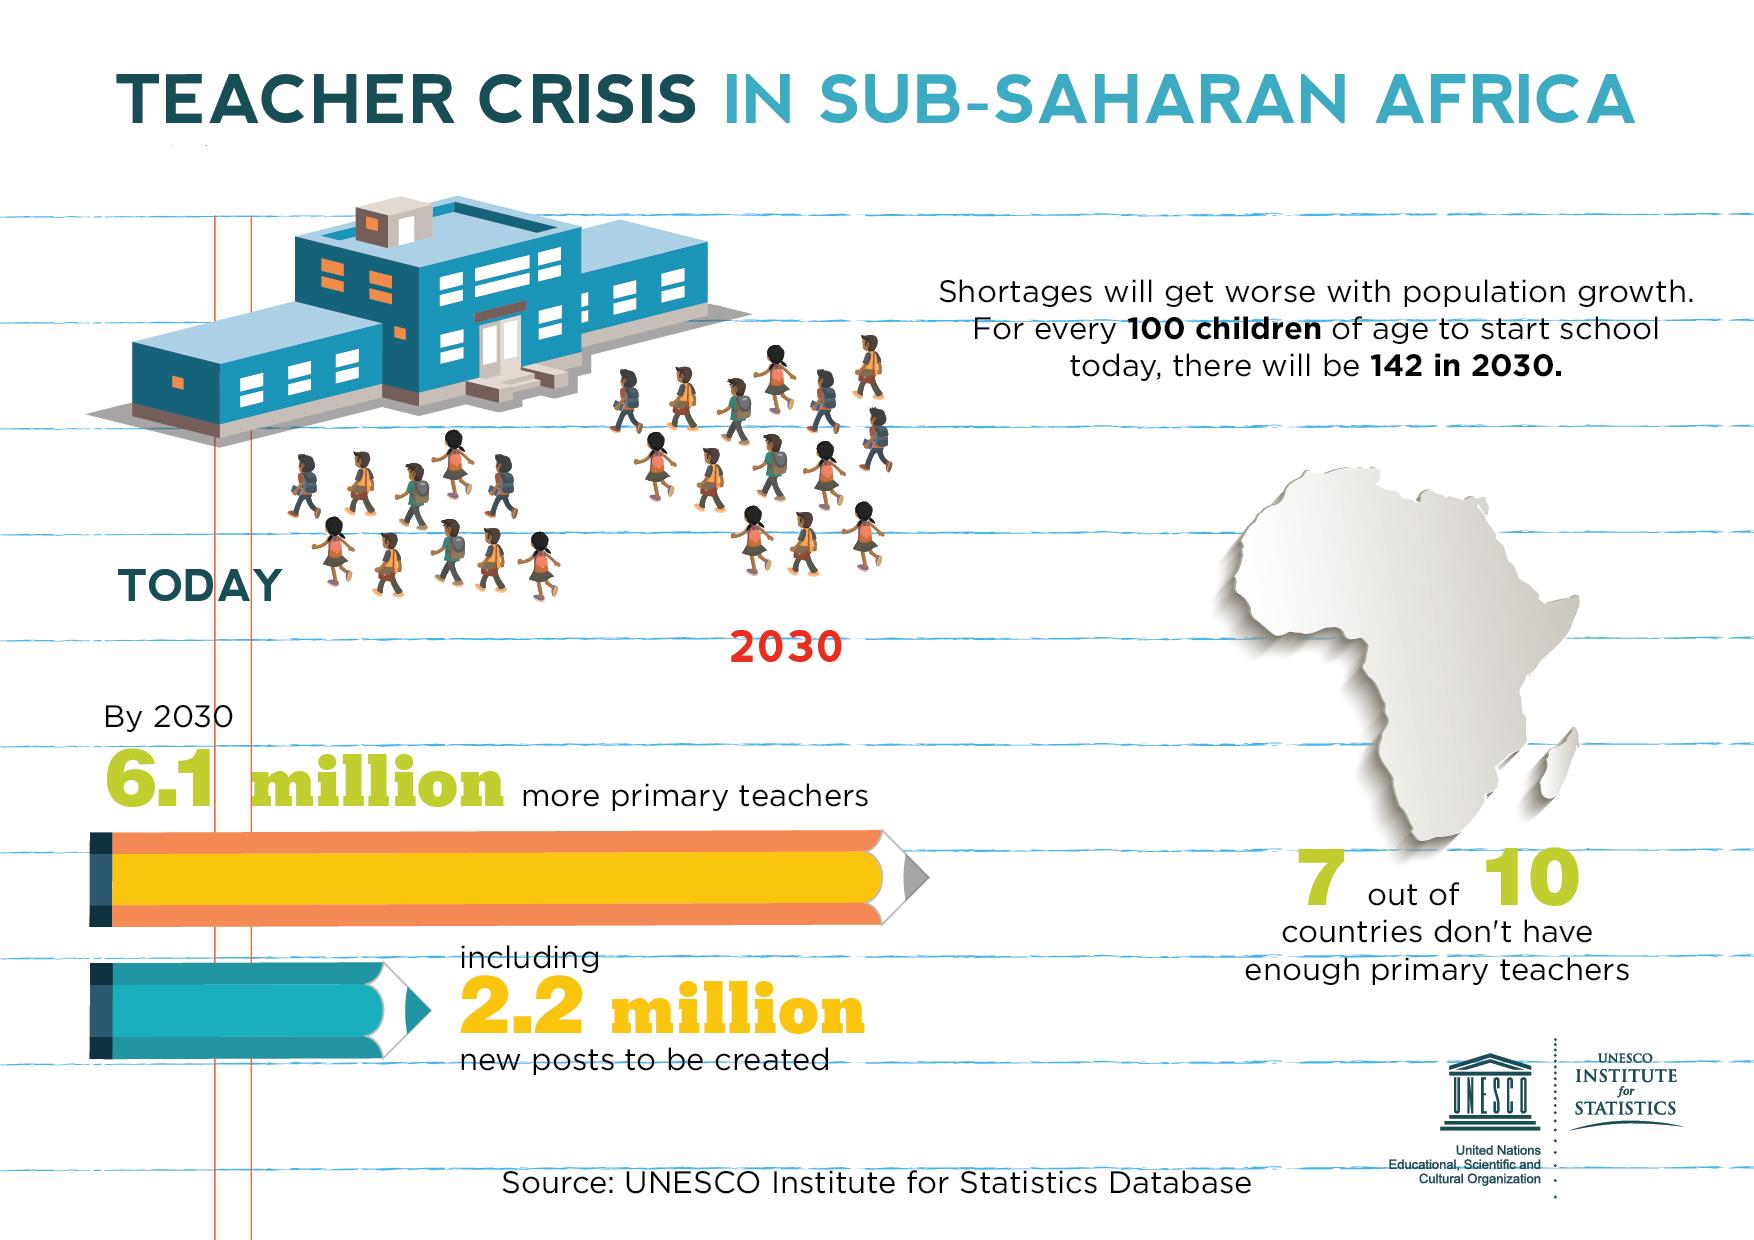 Sub-Saharan Africa education